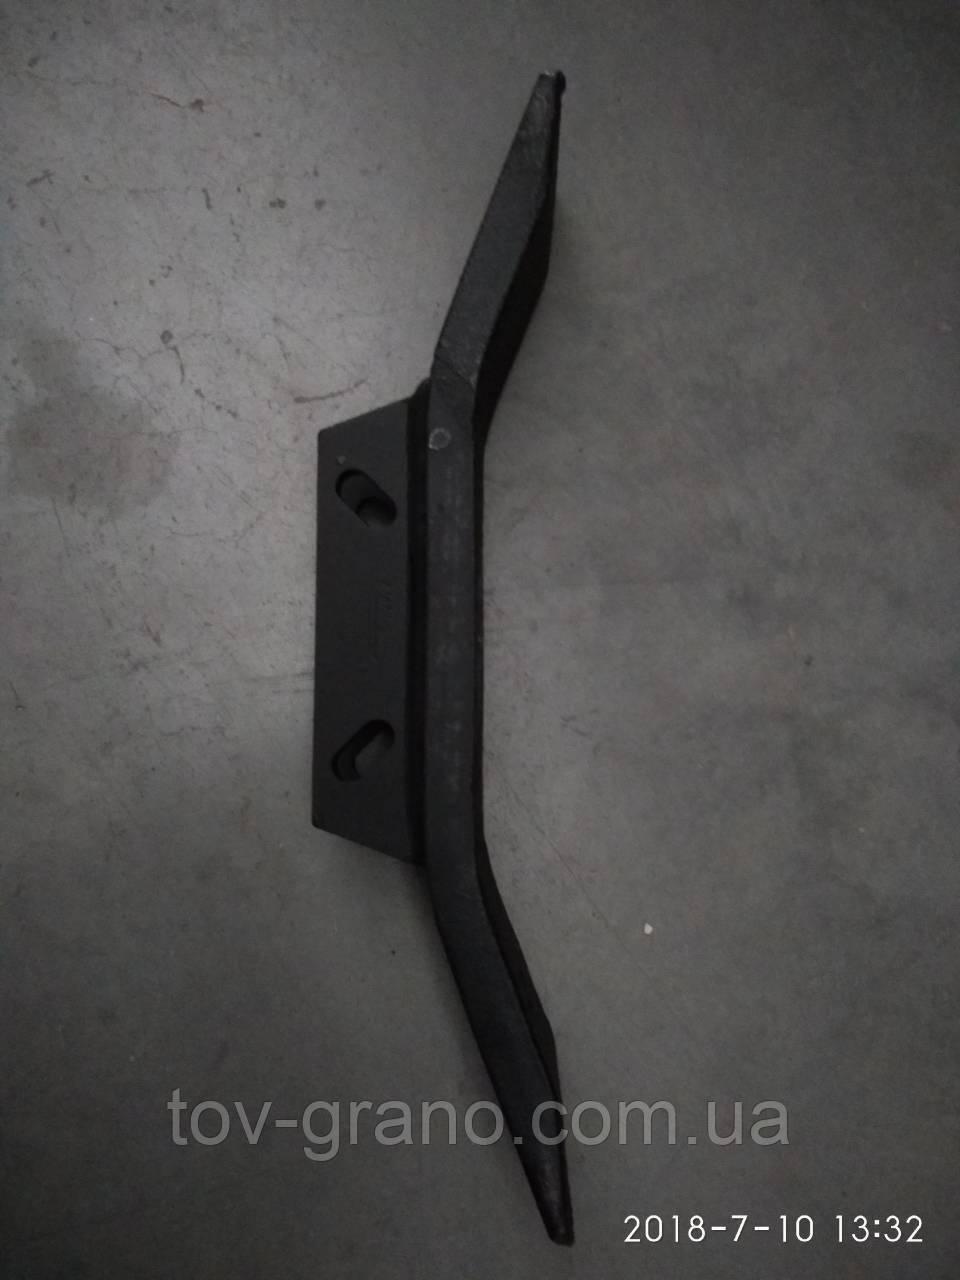 Долото R17820721 TG Gaspardo Artiglio (усиленное)